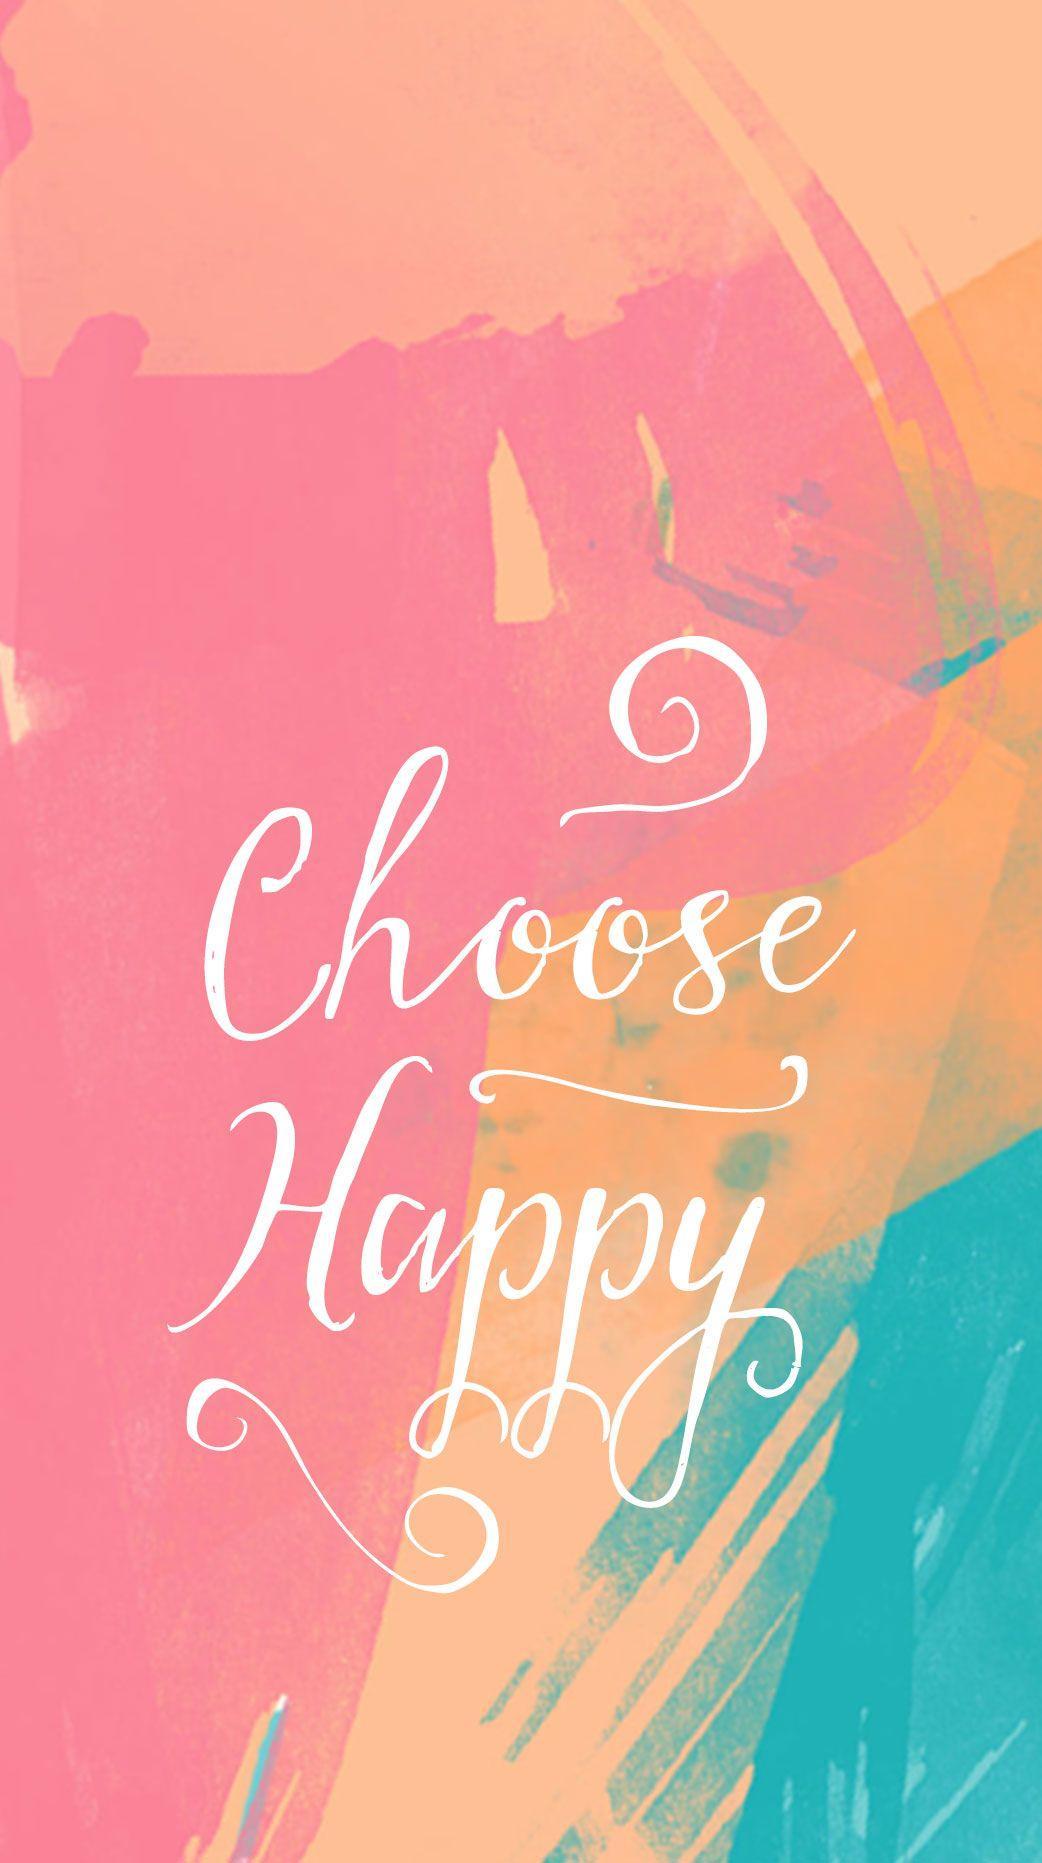 Happy Bright Wallpaper : happy, bright, wallpaper, Happy, IPhone, Wallpapers, Backgrounds, WallpaperAccess